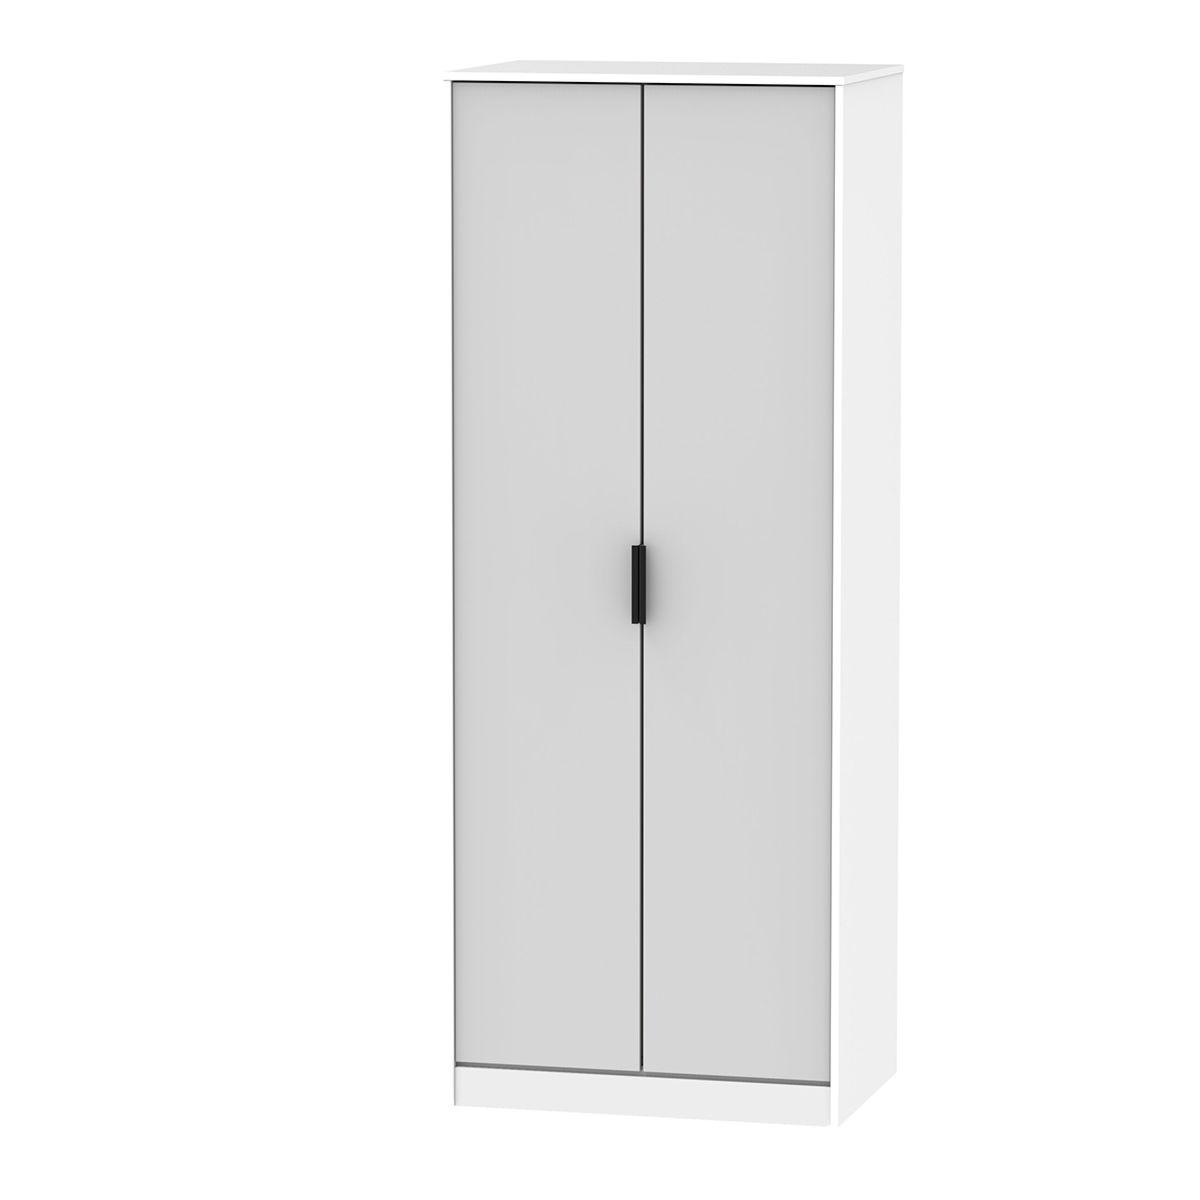 Hirato 2 Door Grey/White Wardrobe